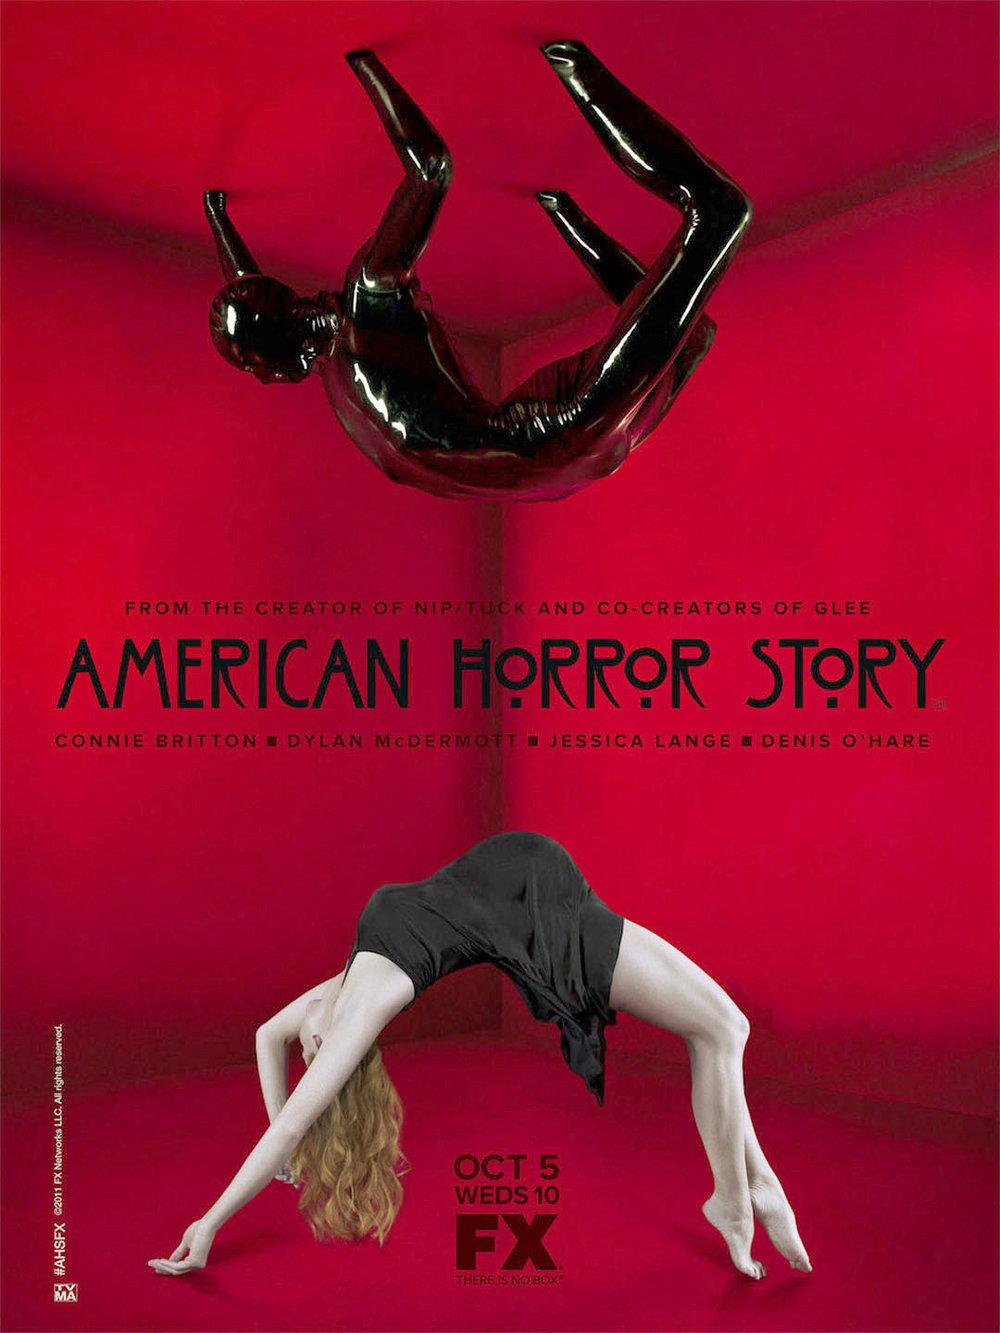 52-american-horror-story-poster-seriesdanko-JG.jpg